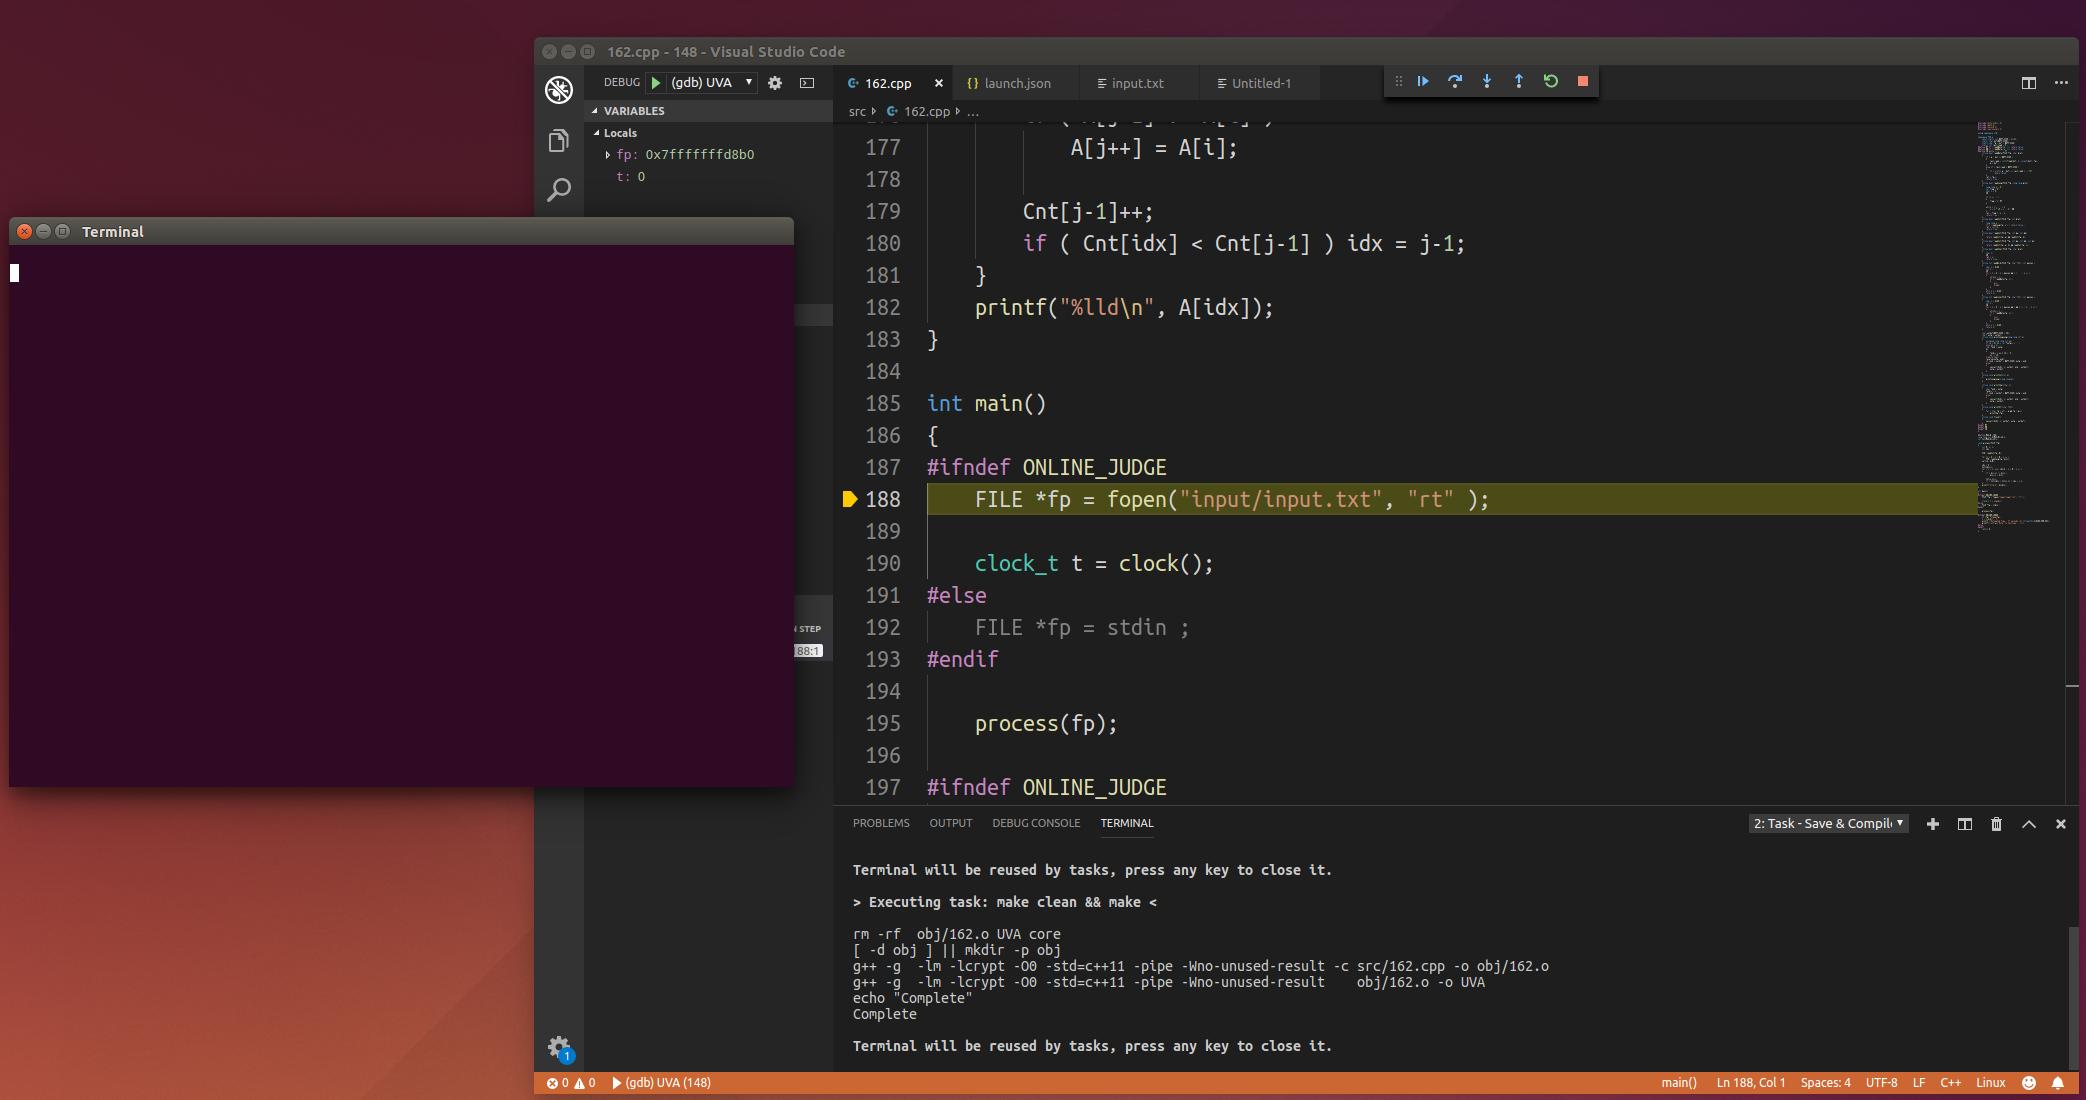 GDB C/C++ debugger won't start, giving error · Issue #64948